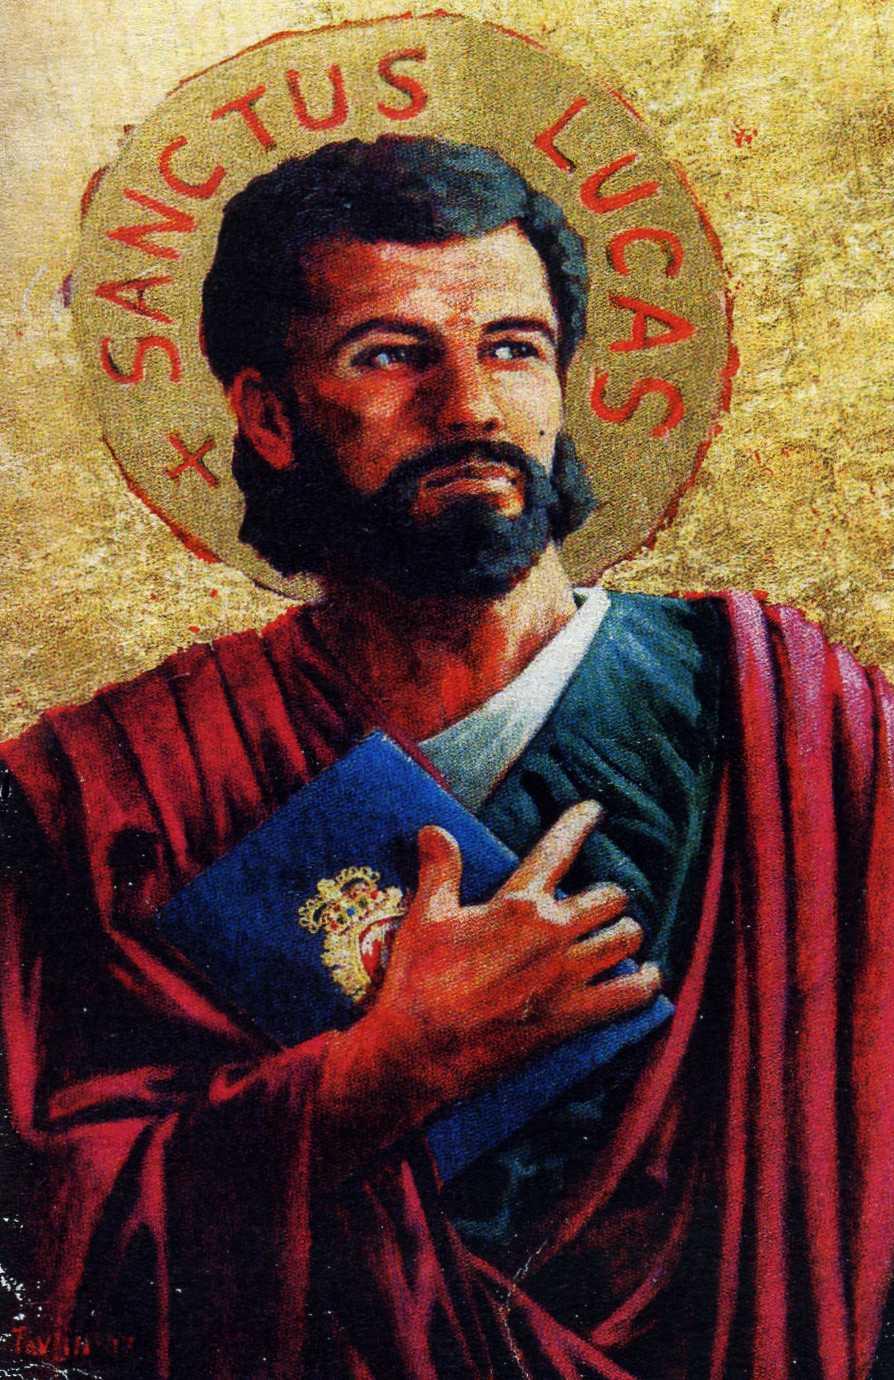 Patron Saint / Saint patron